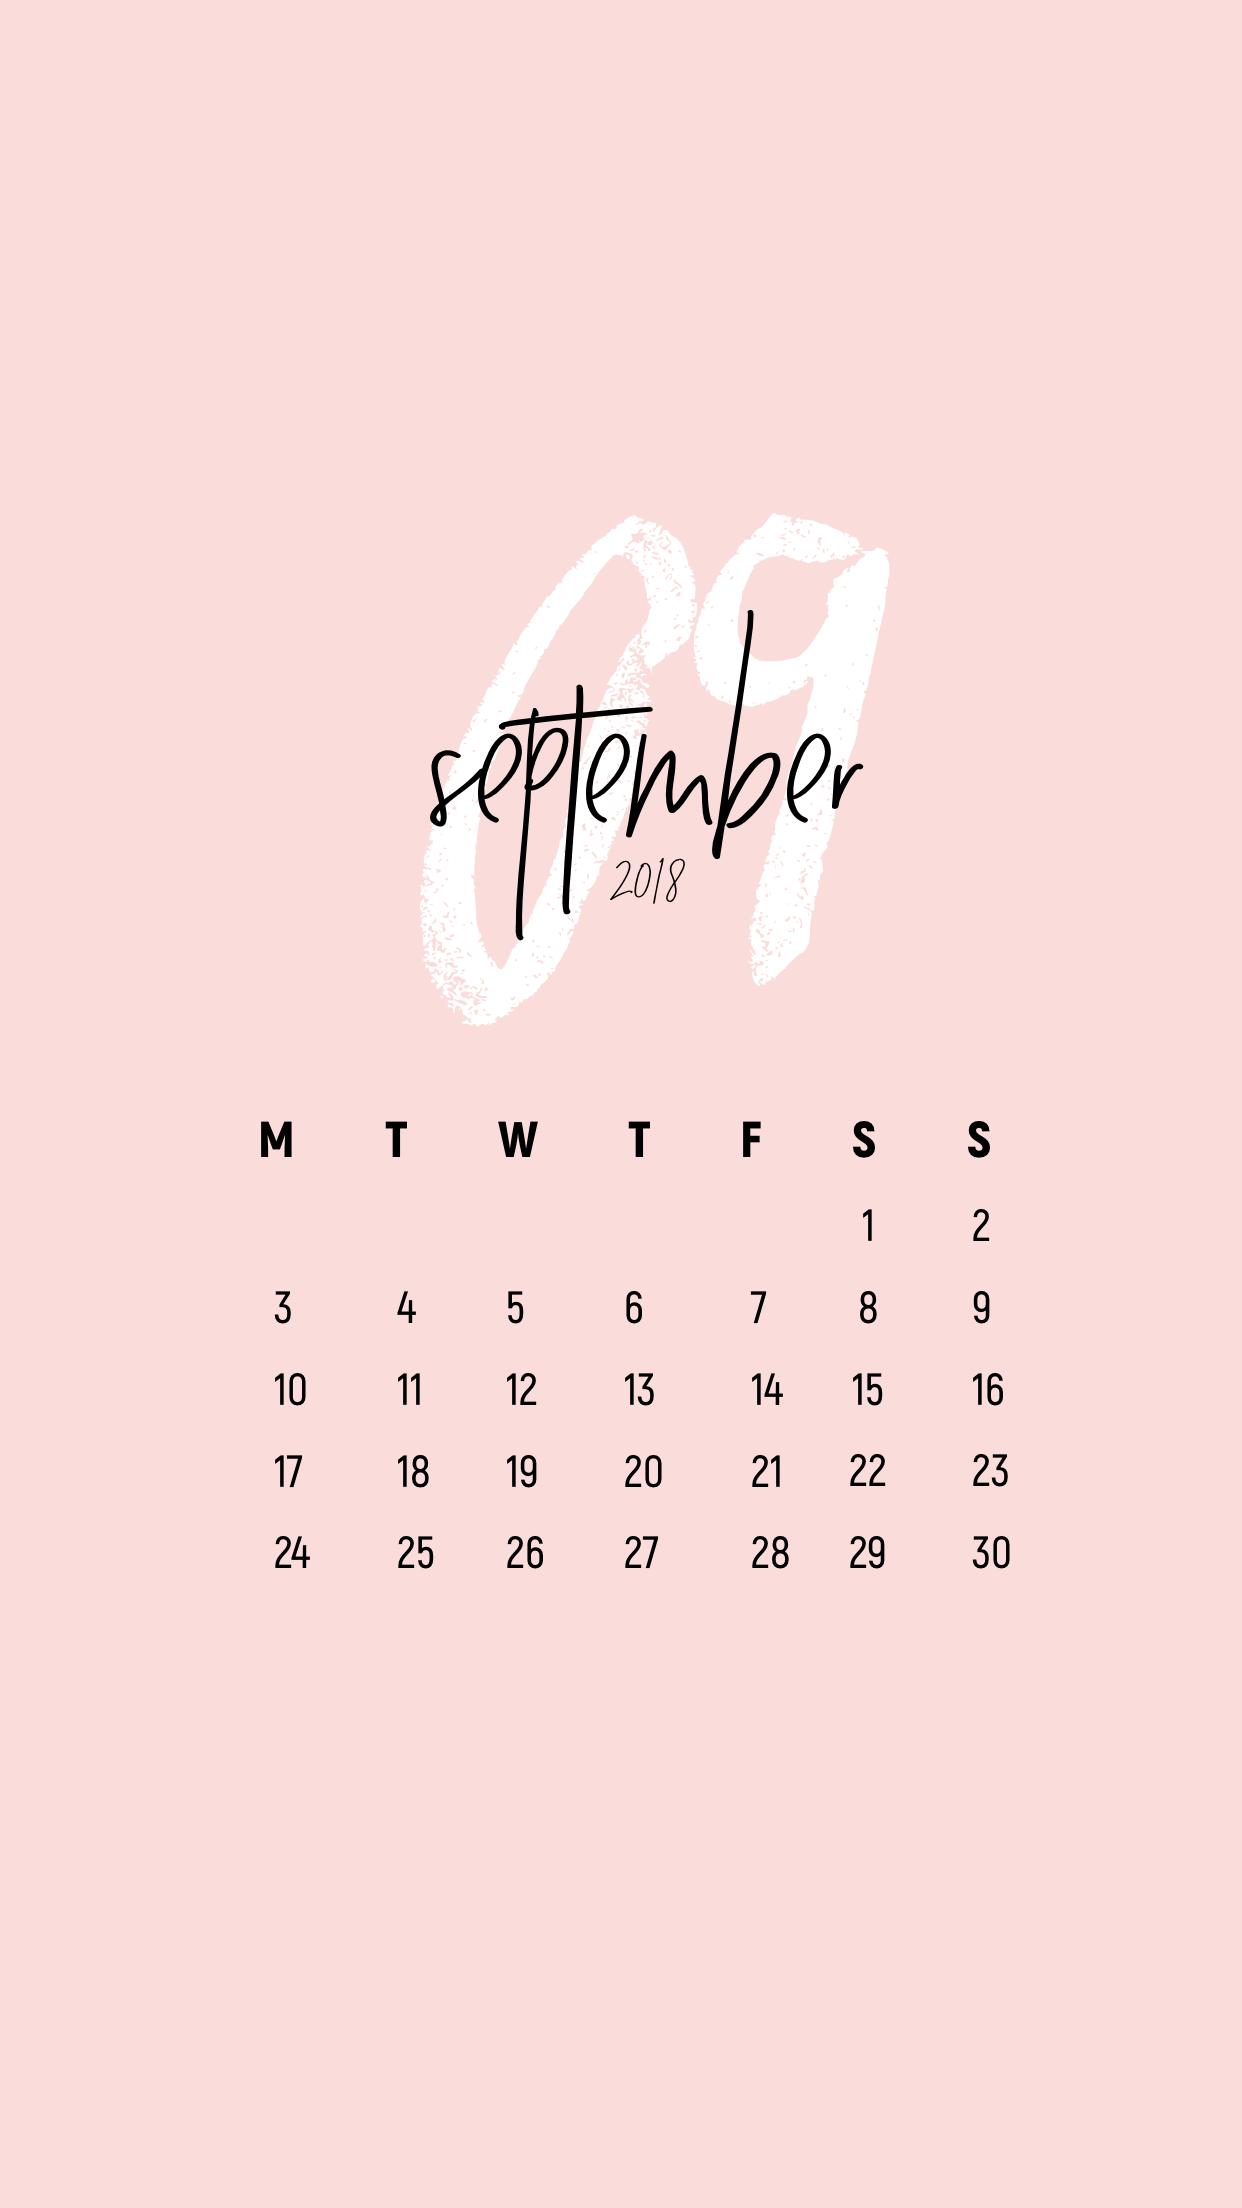 Minimal September 2018 Calendar Wallpaper Iphone Raquel Calendar Wallpaper Desktop Wallpaper Calendar Desktop Calendar Design